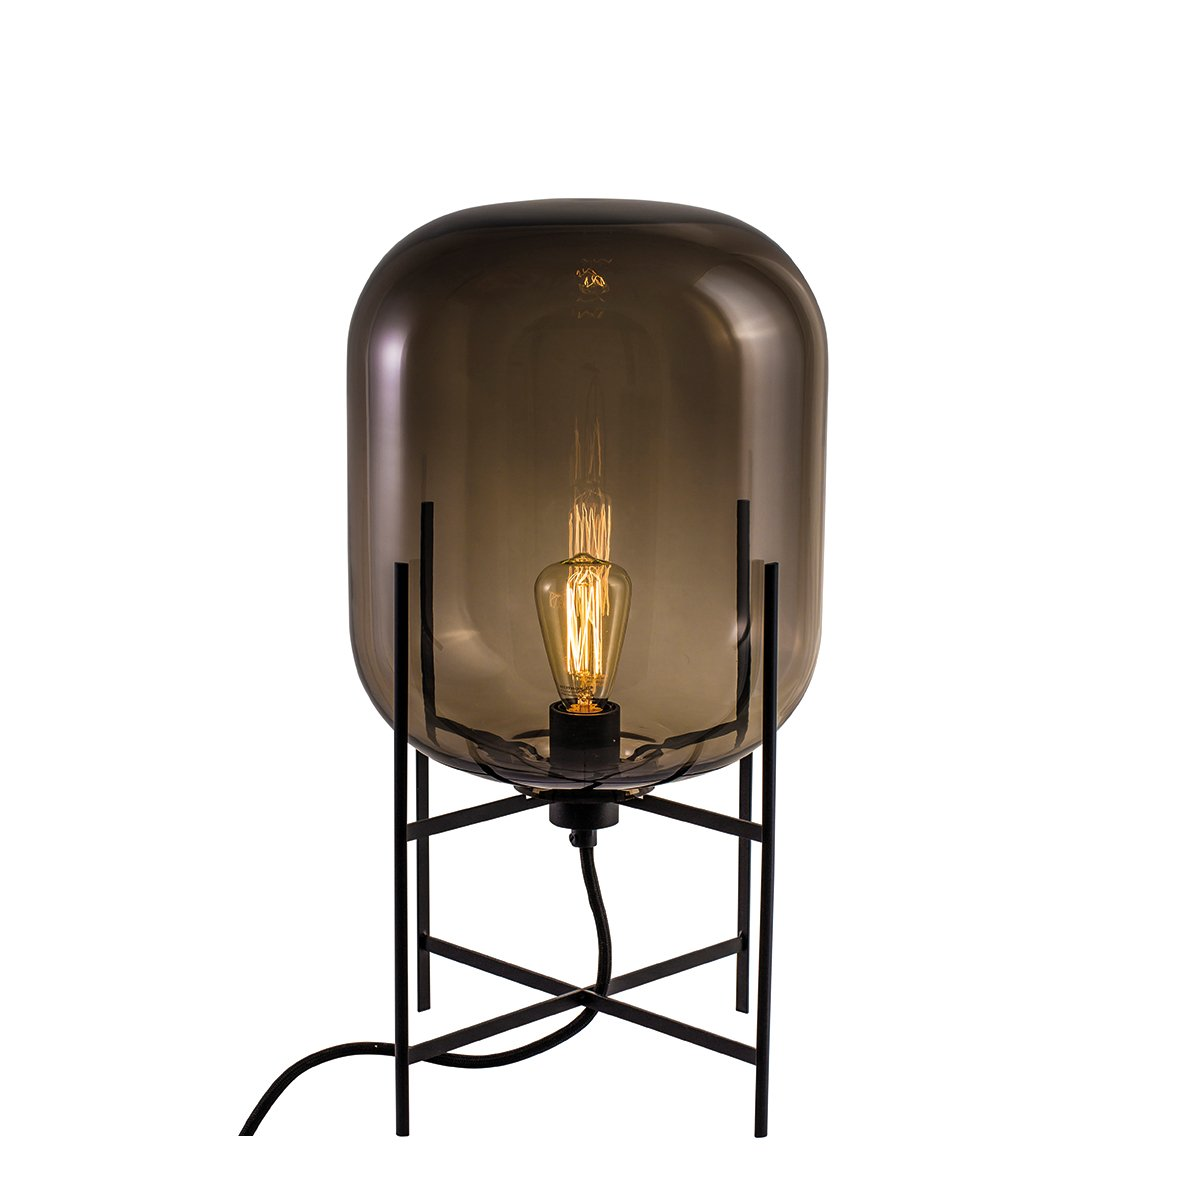 Pulpo Oda Tafellamp Small - Smoke Grey - Zwart